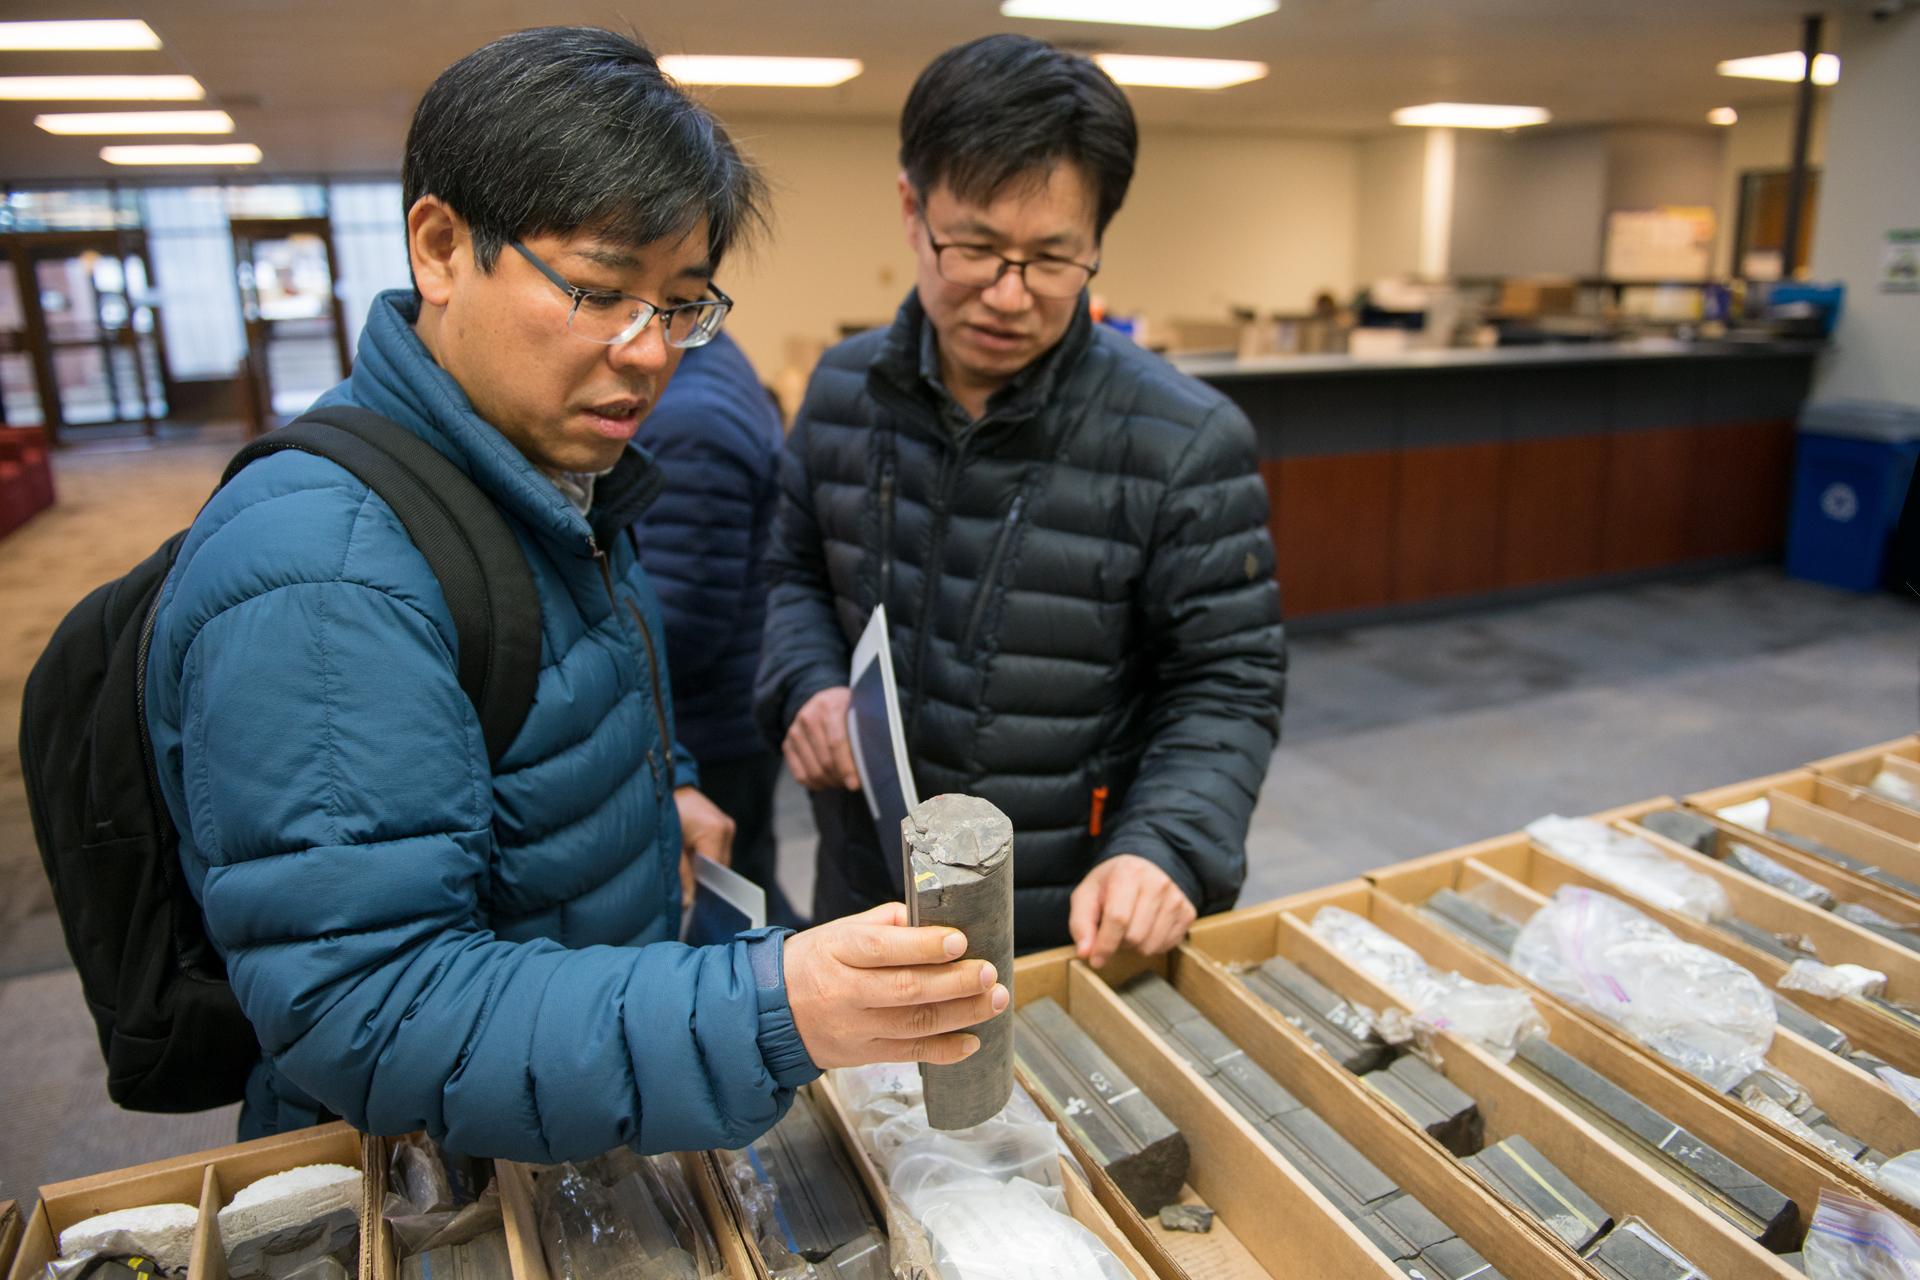 Delegates examine core samples at the Core Research Centre.